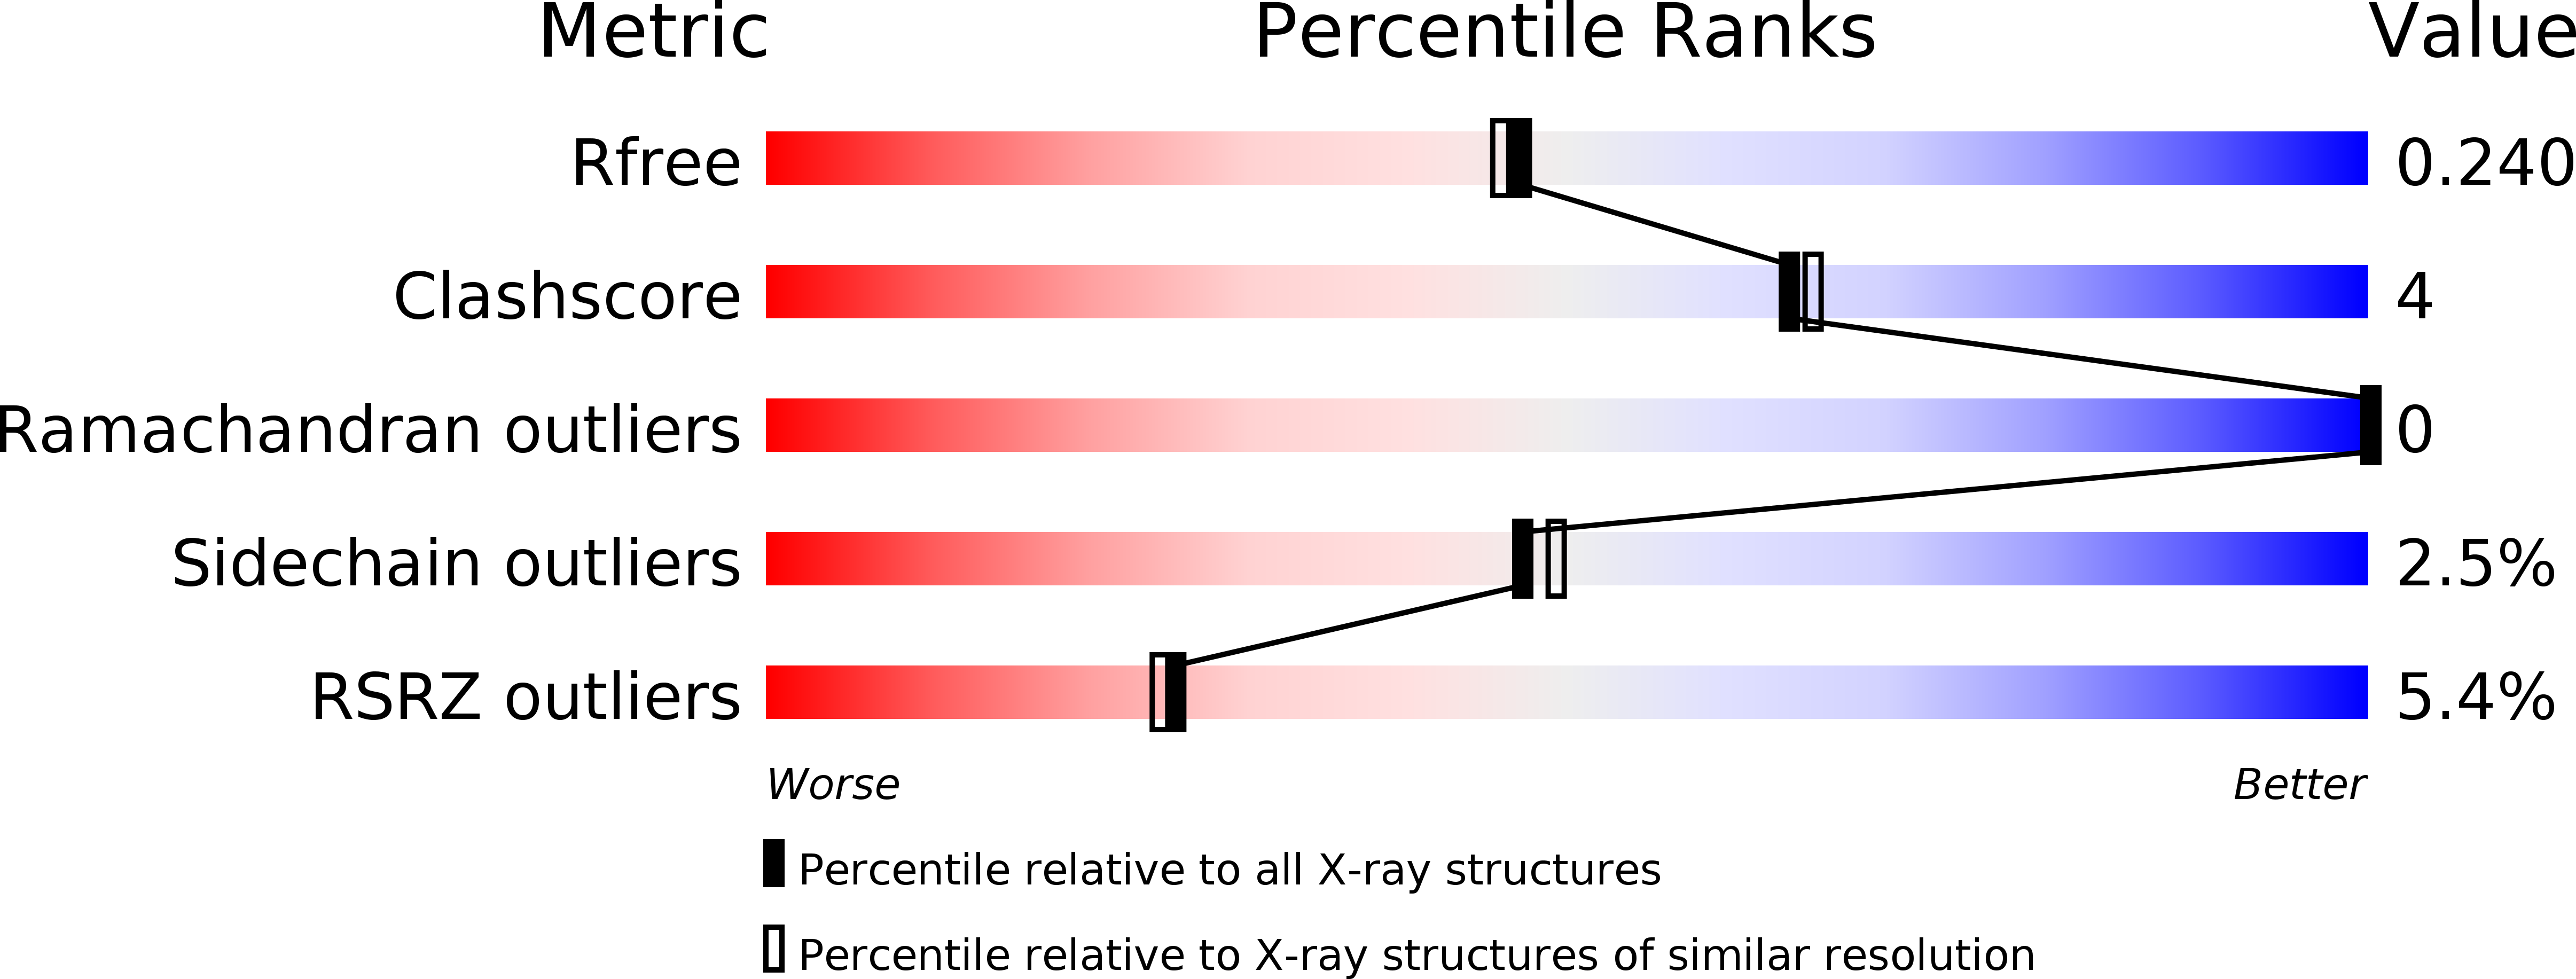 RCSB PDB - 6ISA: mCD226